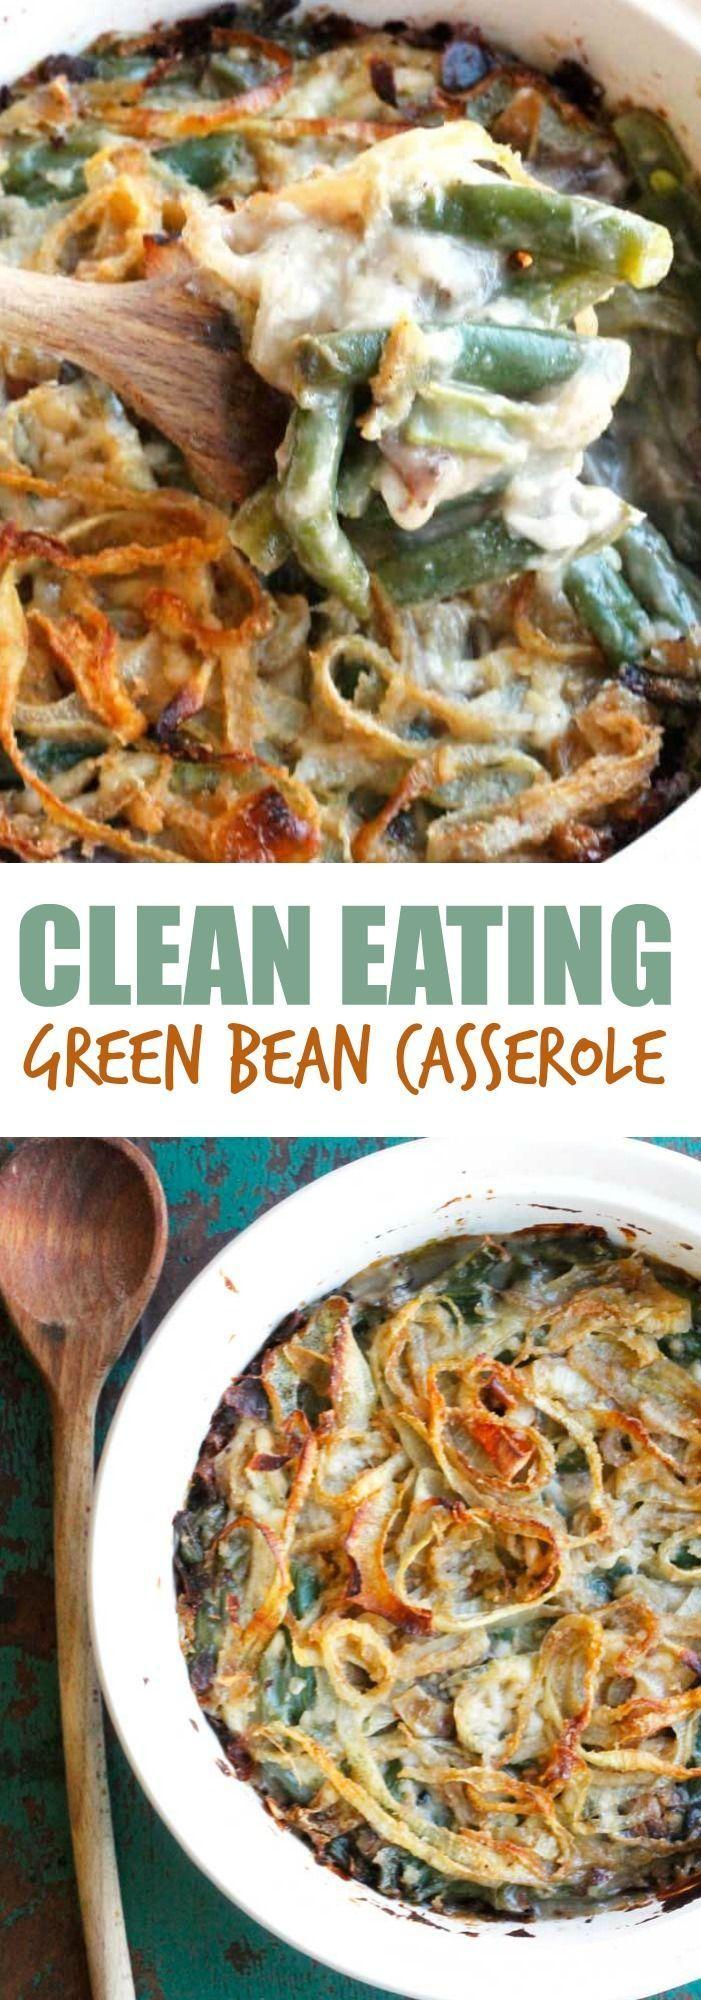 Clean Eating Green Bean Casserole - Smile Sandwich